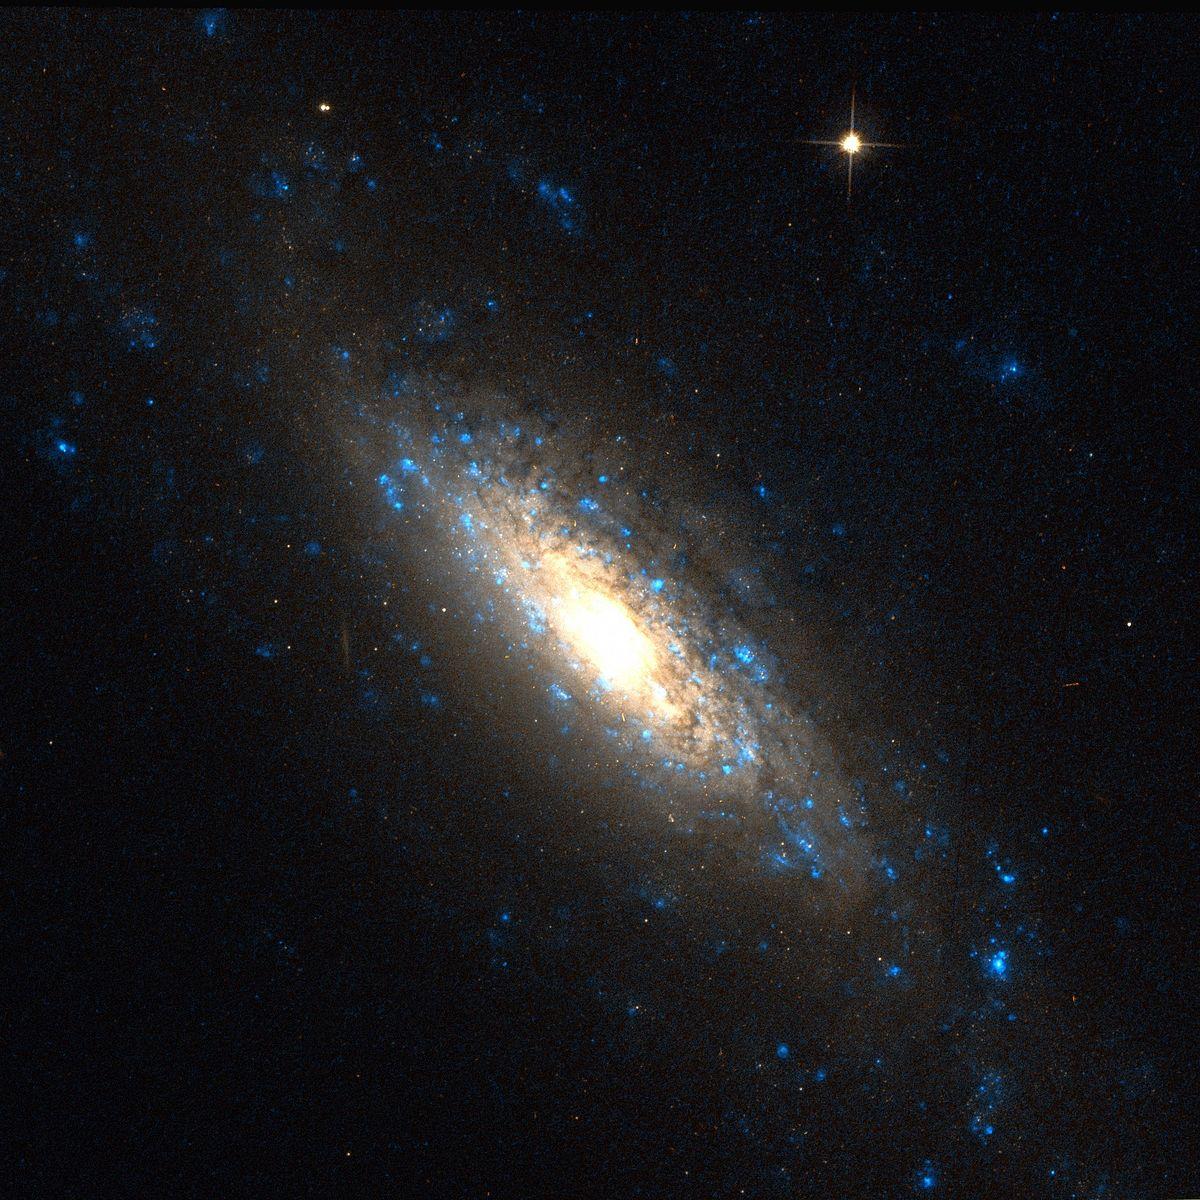 Aufnahme mittels des Hubble-Weltraumteleskops